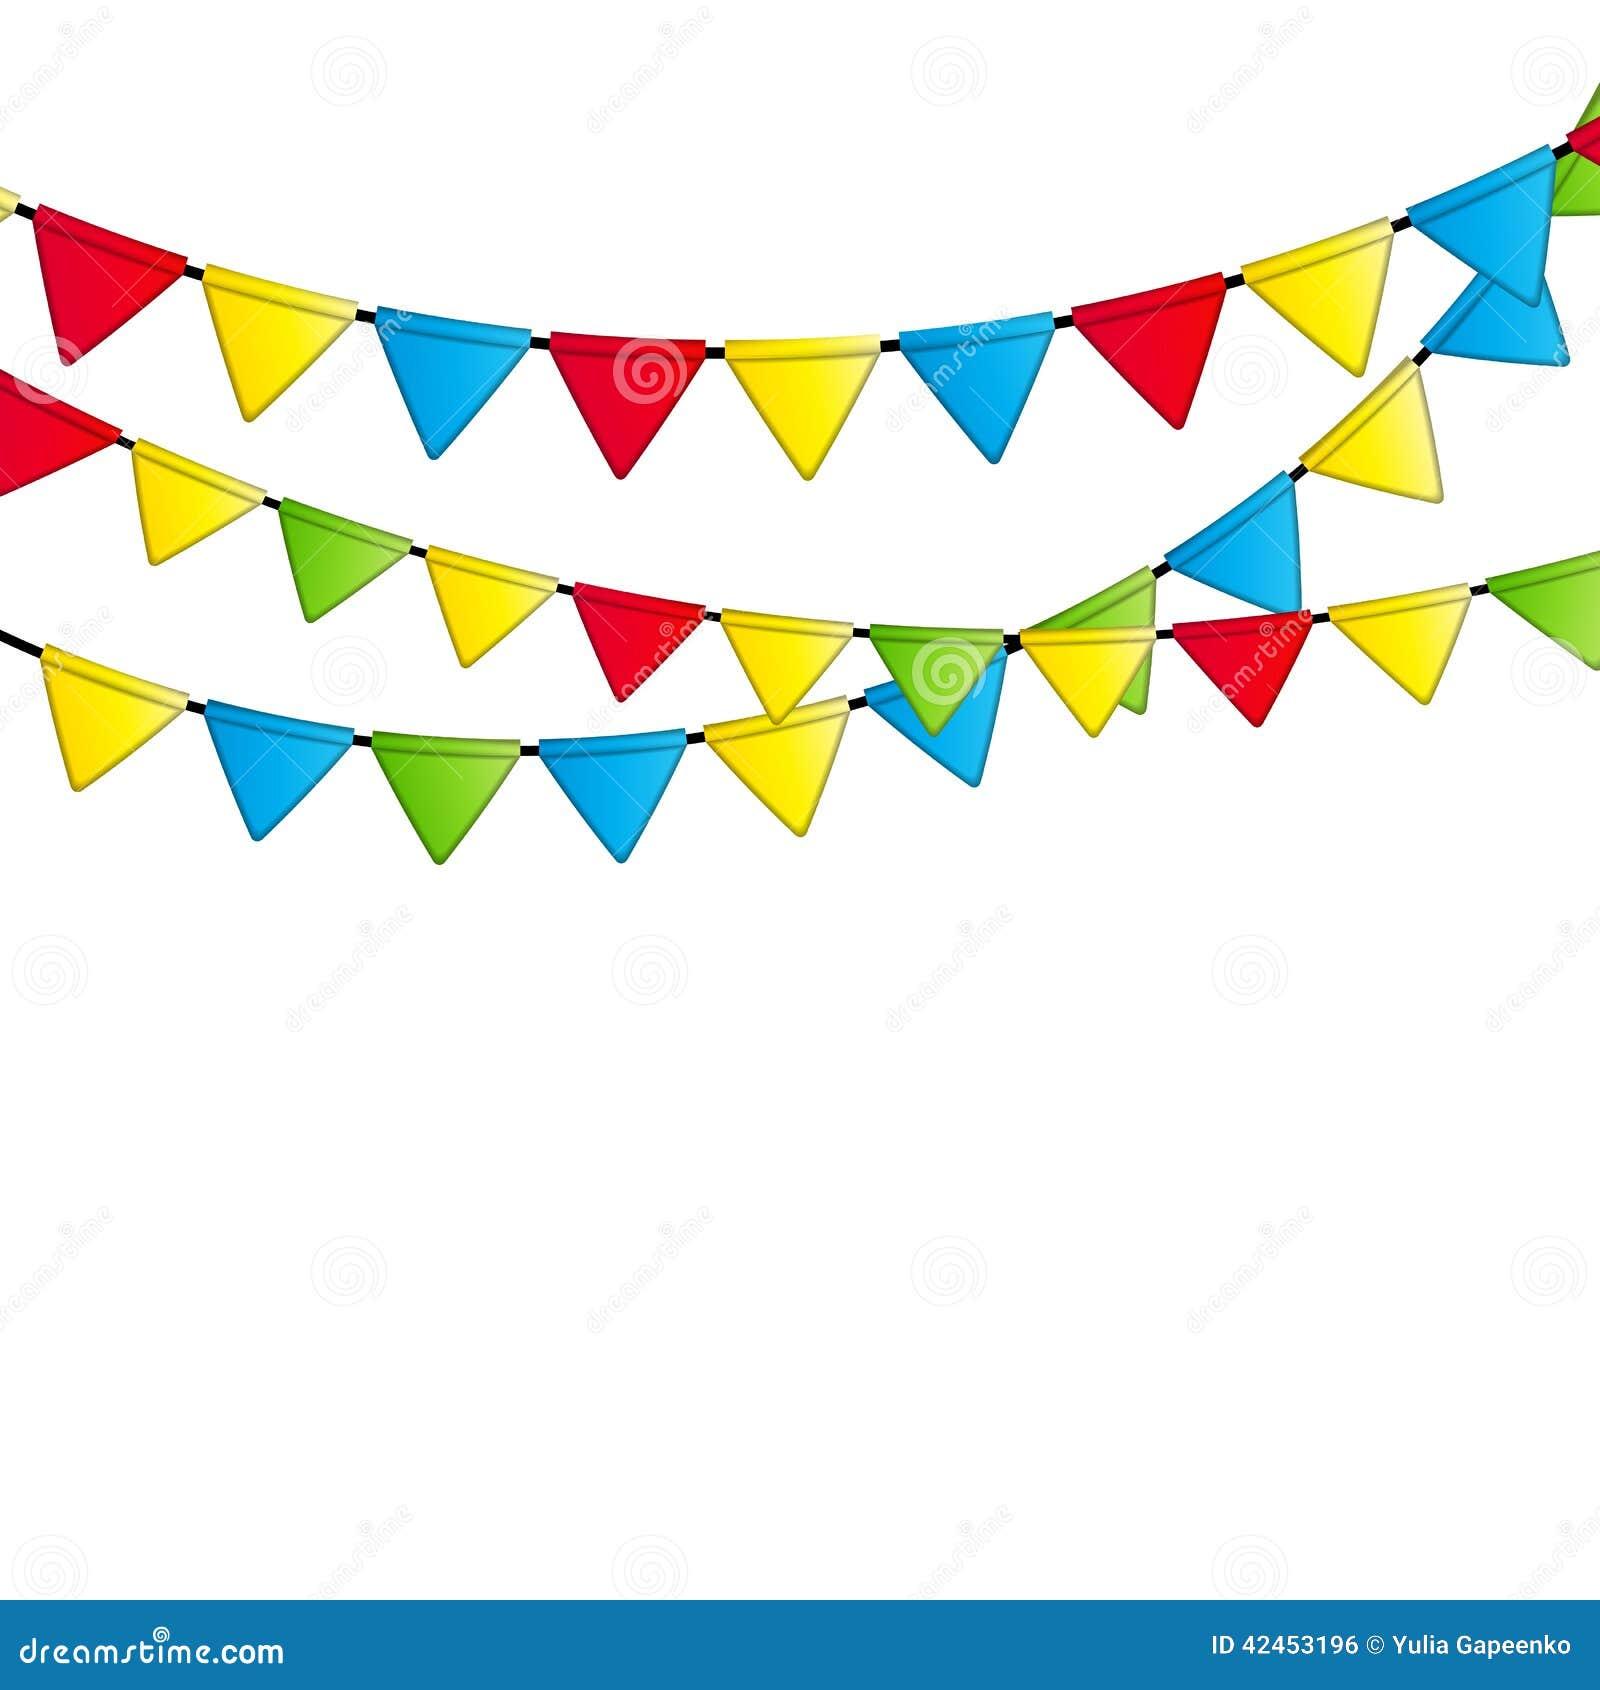 party flag background vector illustration eps 10 stock summer fun clipart border summer fun clipart border